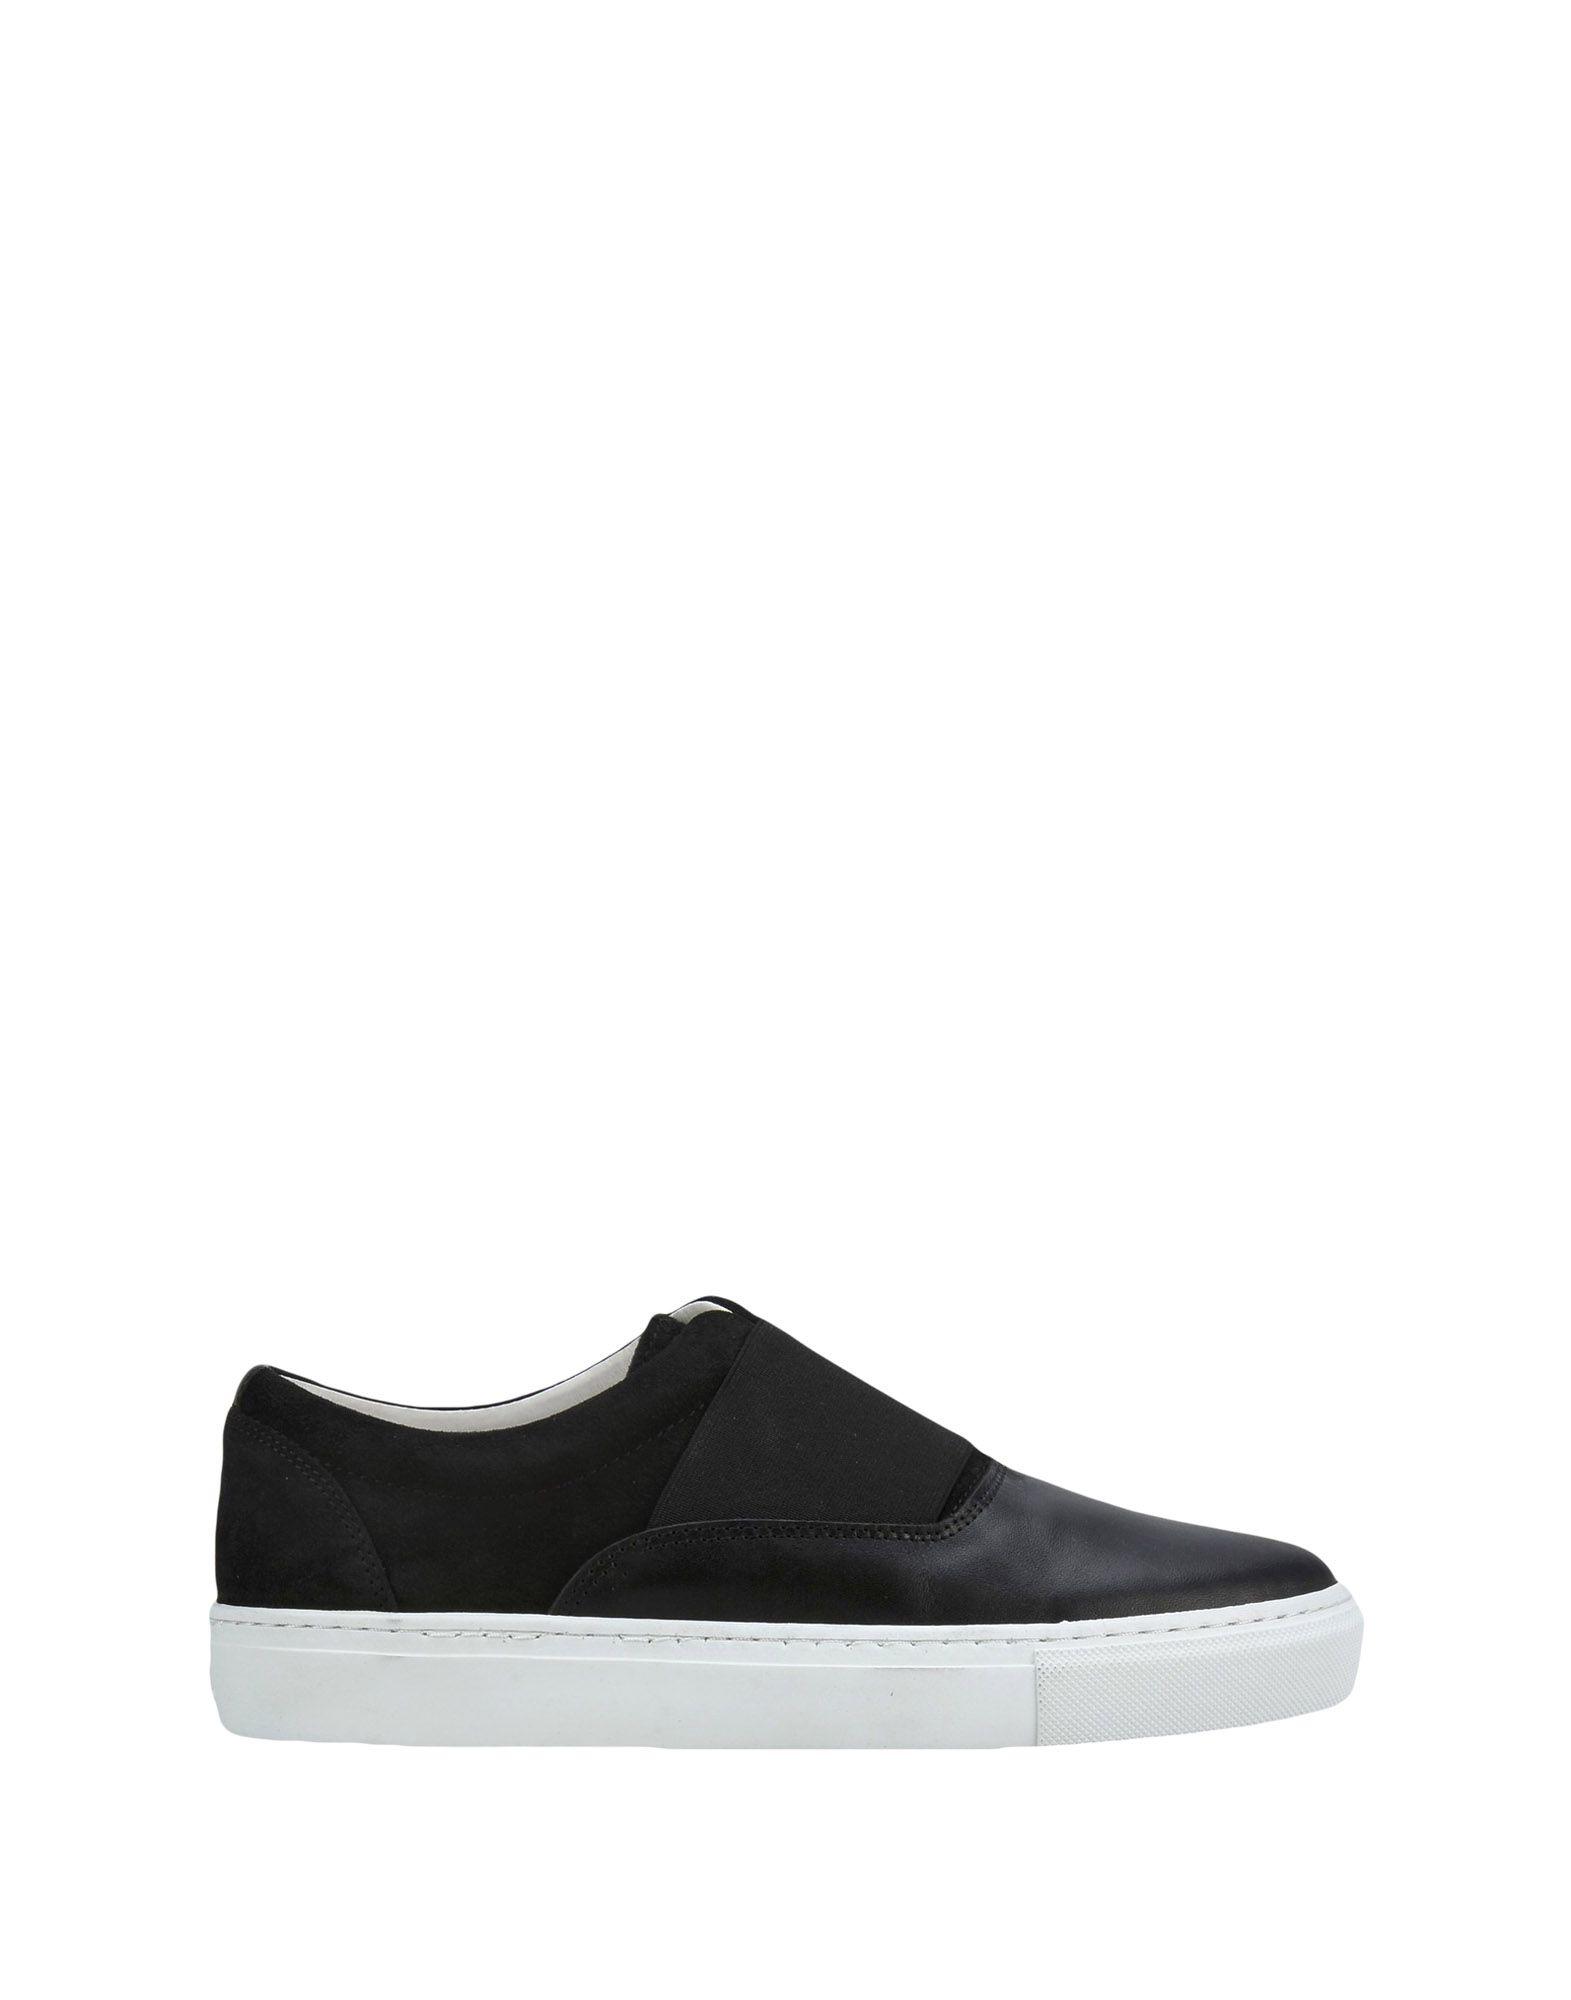 Stilvolle billige Damen Schuhe Wood Wood Sneakers Damen billige  11227755PQ 417c32